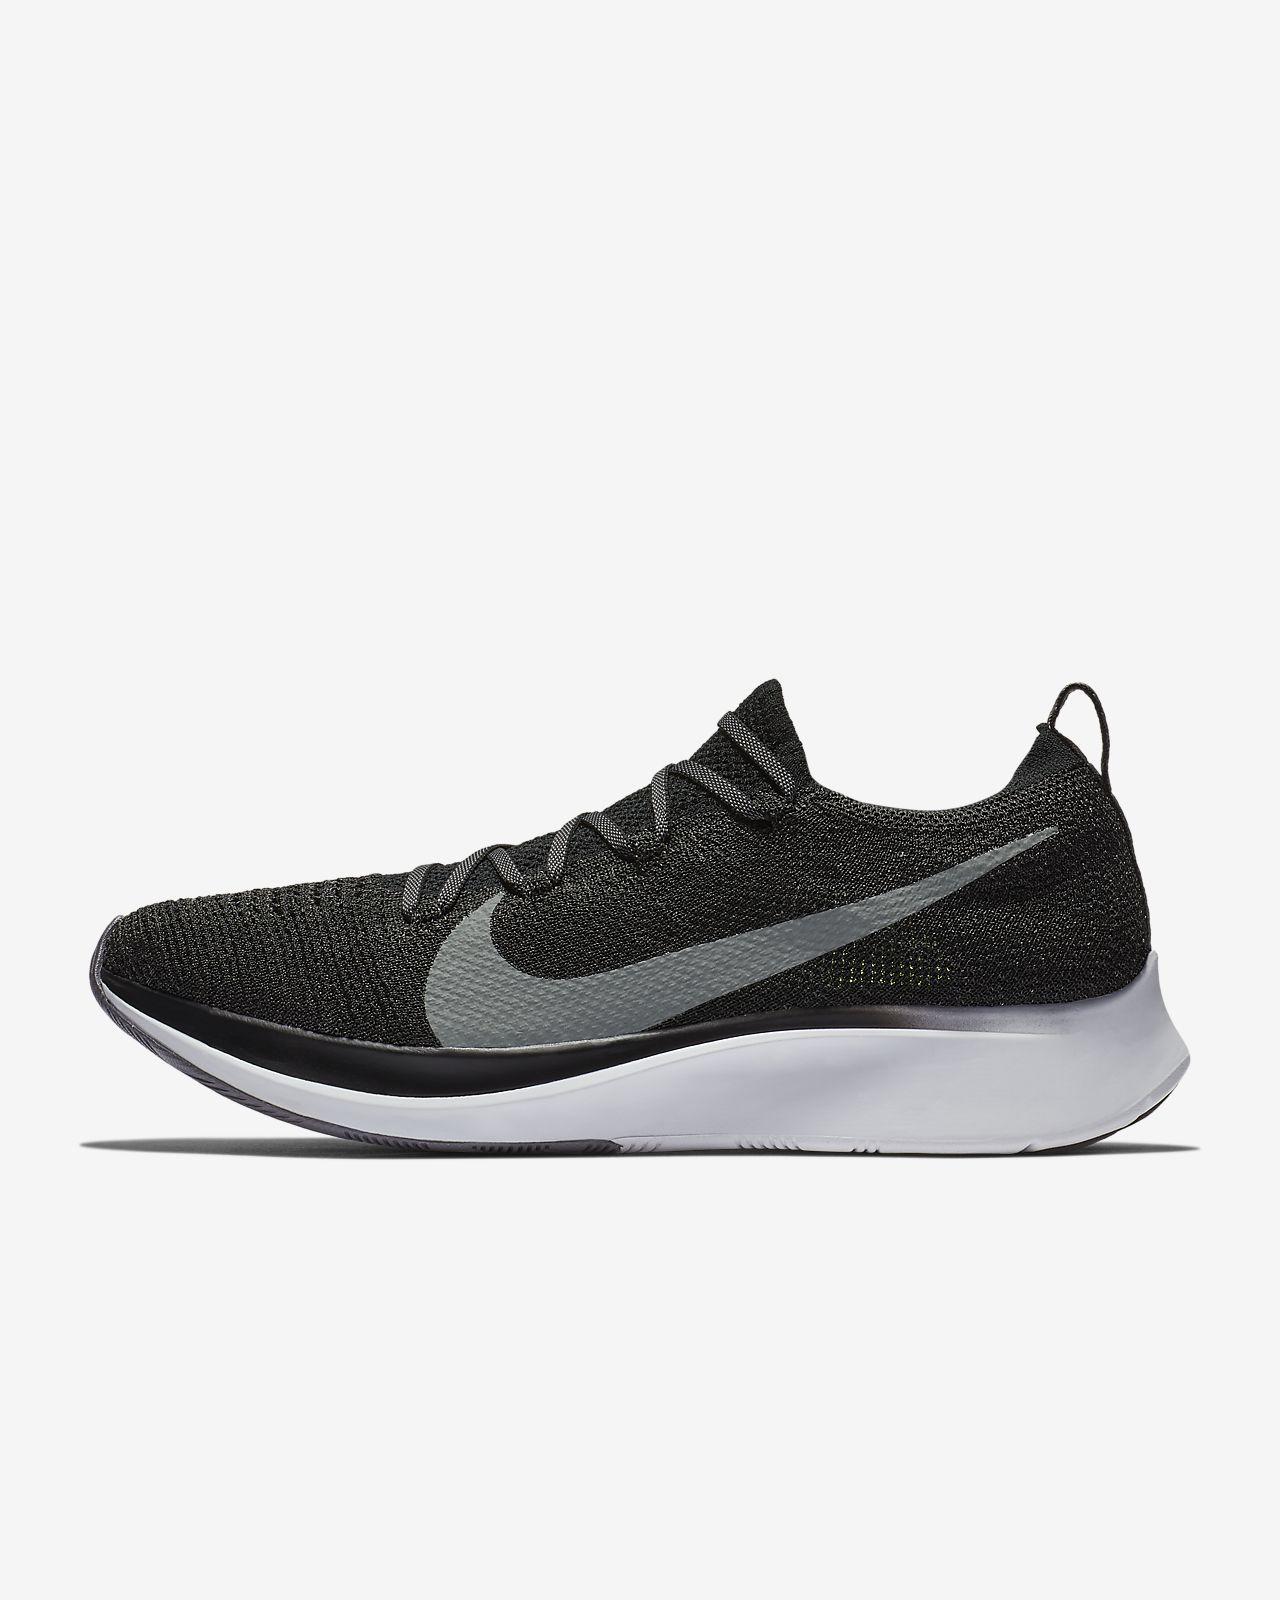 Nike Zoom Fly Flyknit Sabatilles de running - Home